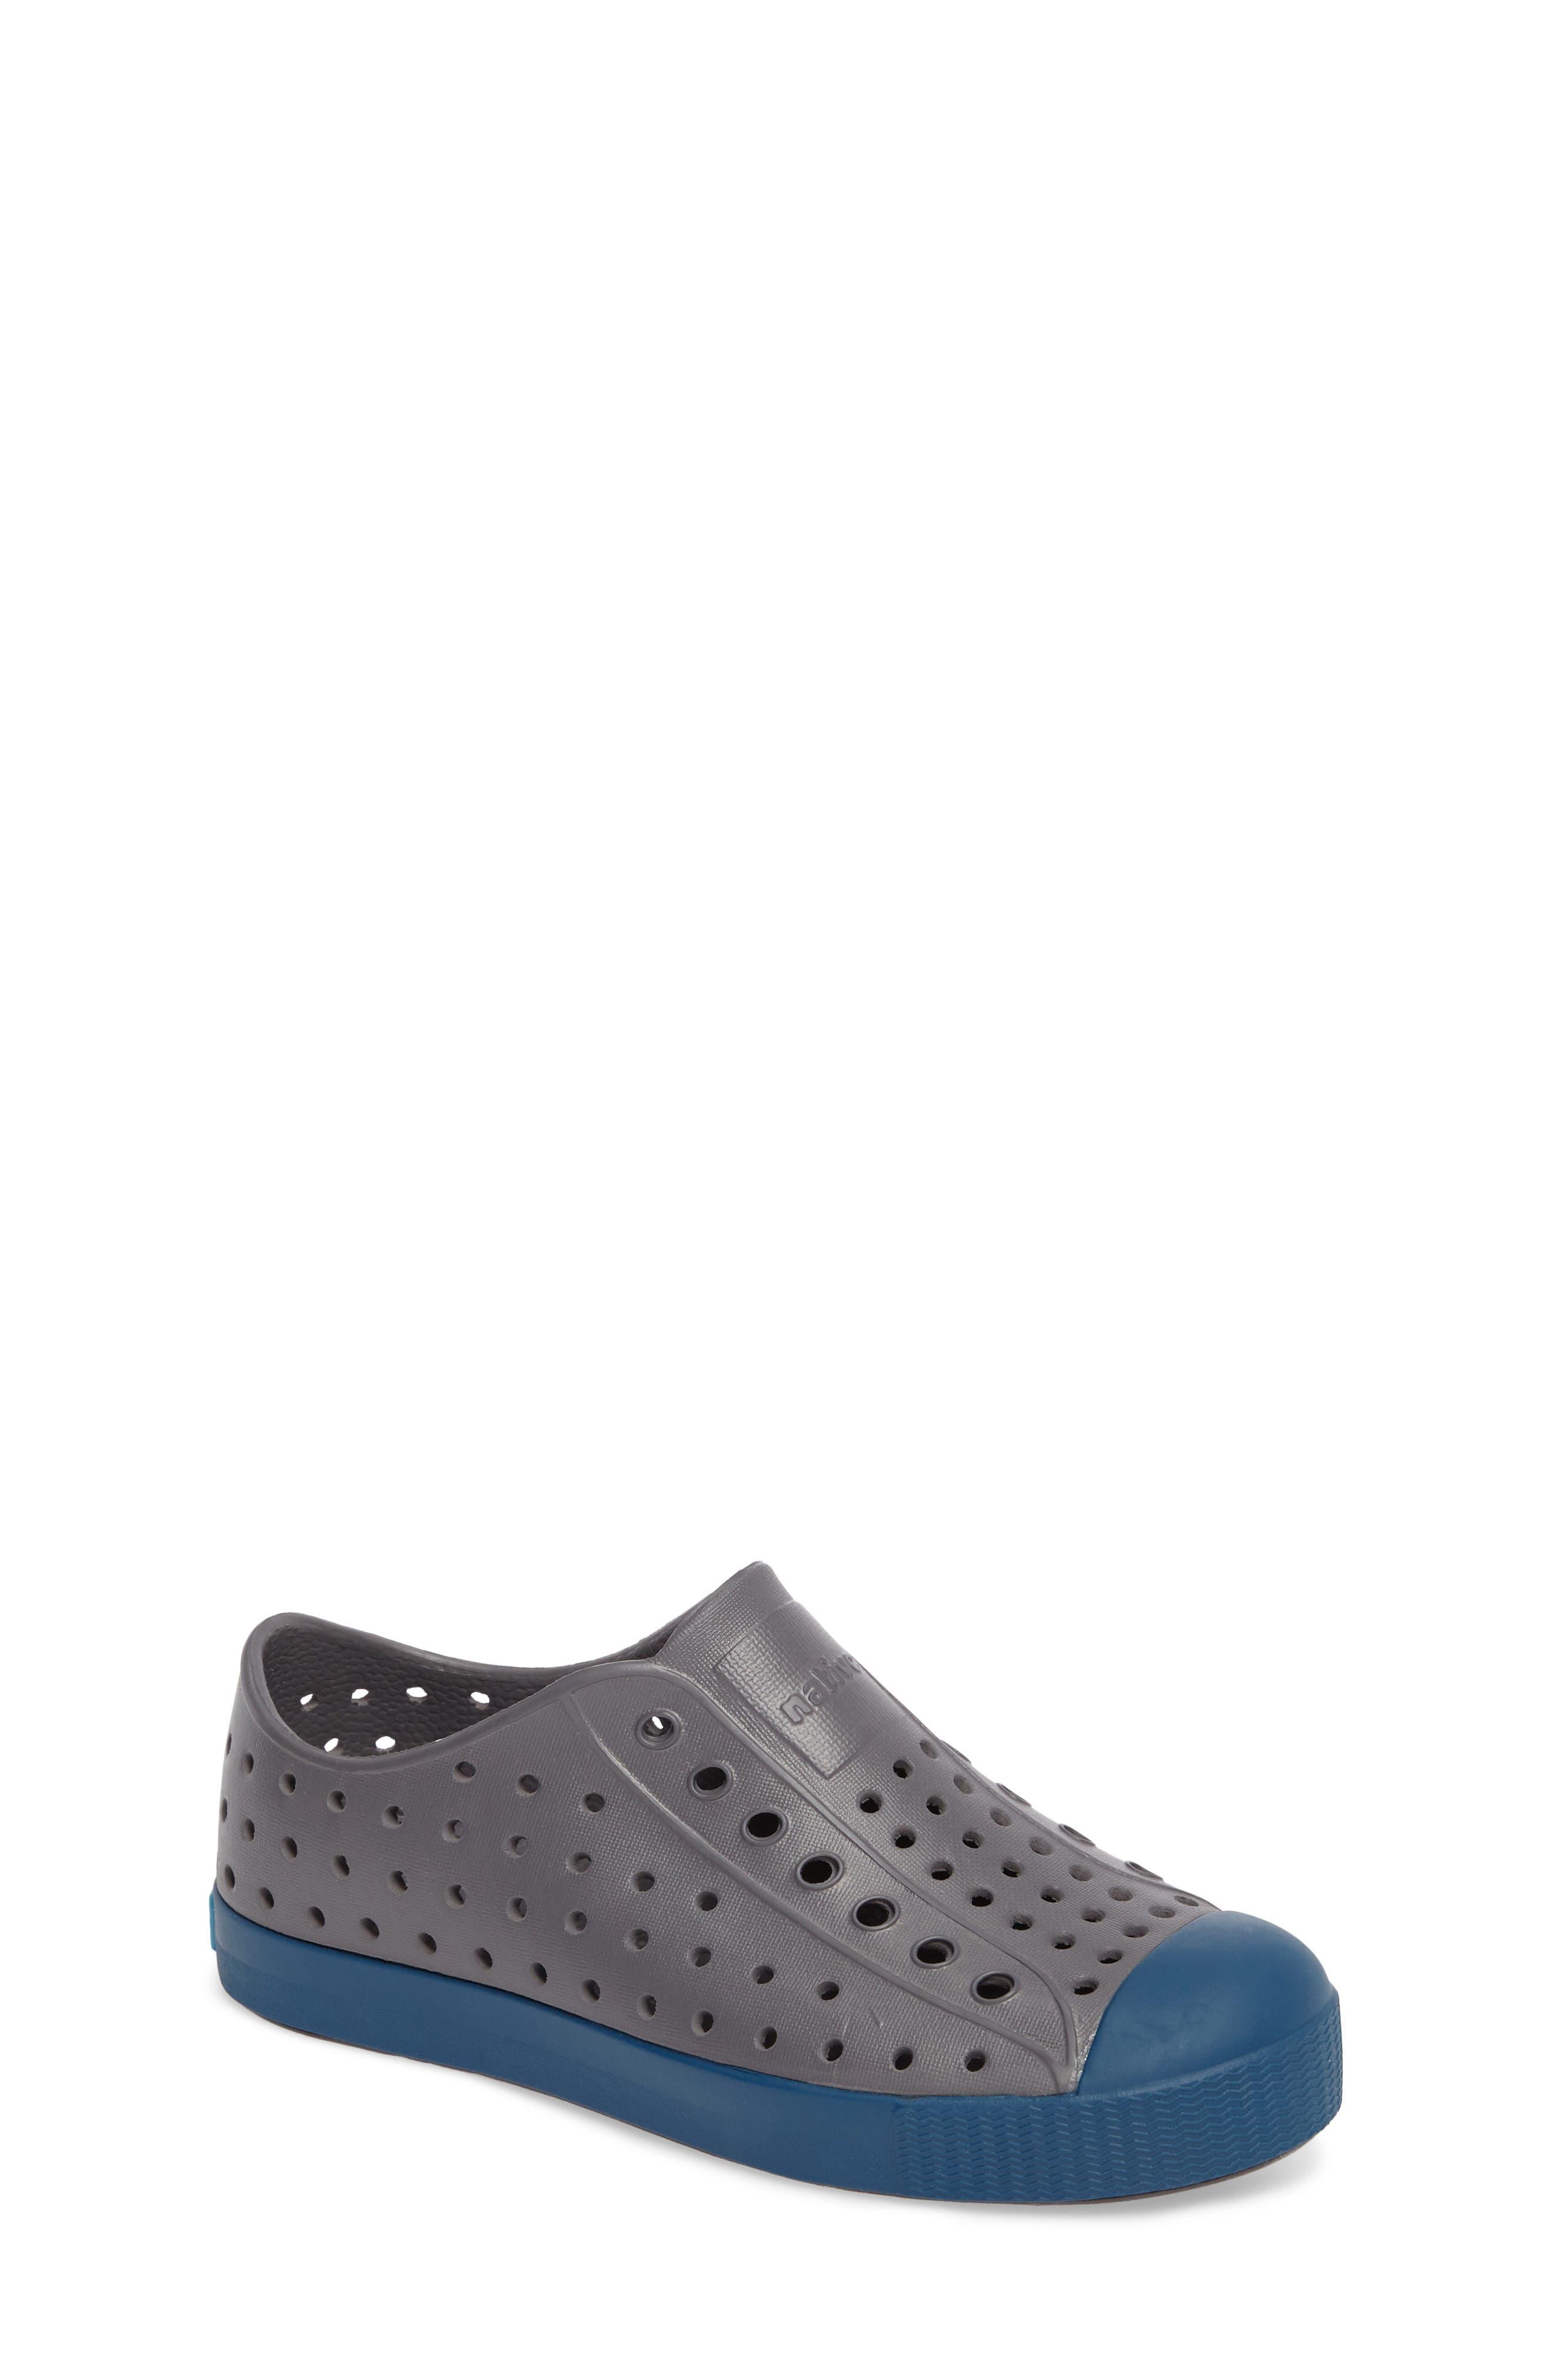 'Jefferson' Water Friendly Slip-On Sneaker,                             Main thumbnail 34, color,